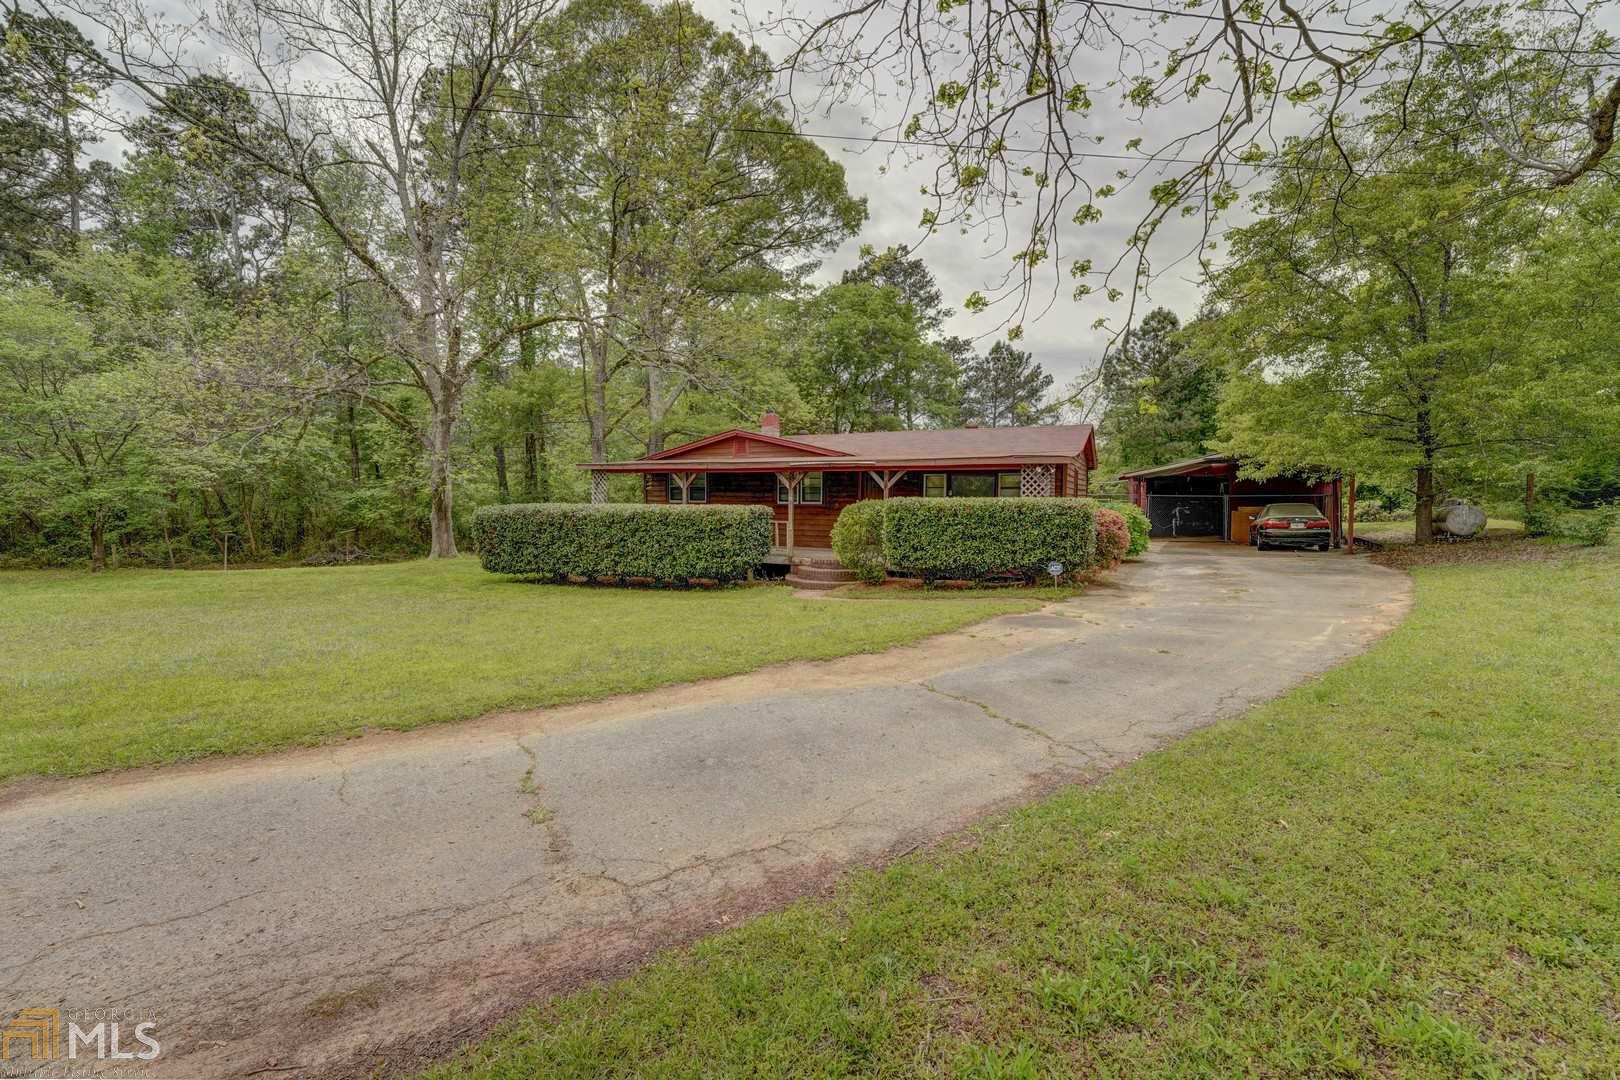 142 Alexander Rd, McDonough, Georgia 30253, 3 Bedrooms Bedrooms, ,1 BathroomBathrooms,Single Family,For Sale,142 Alexander Rd,1,8963094